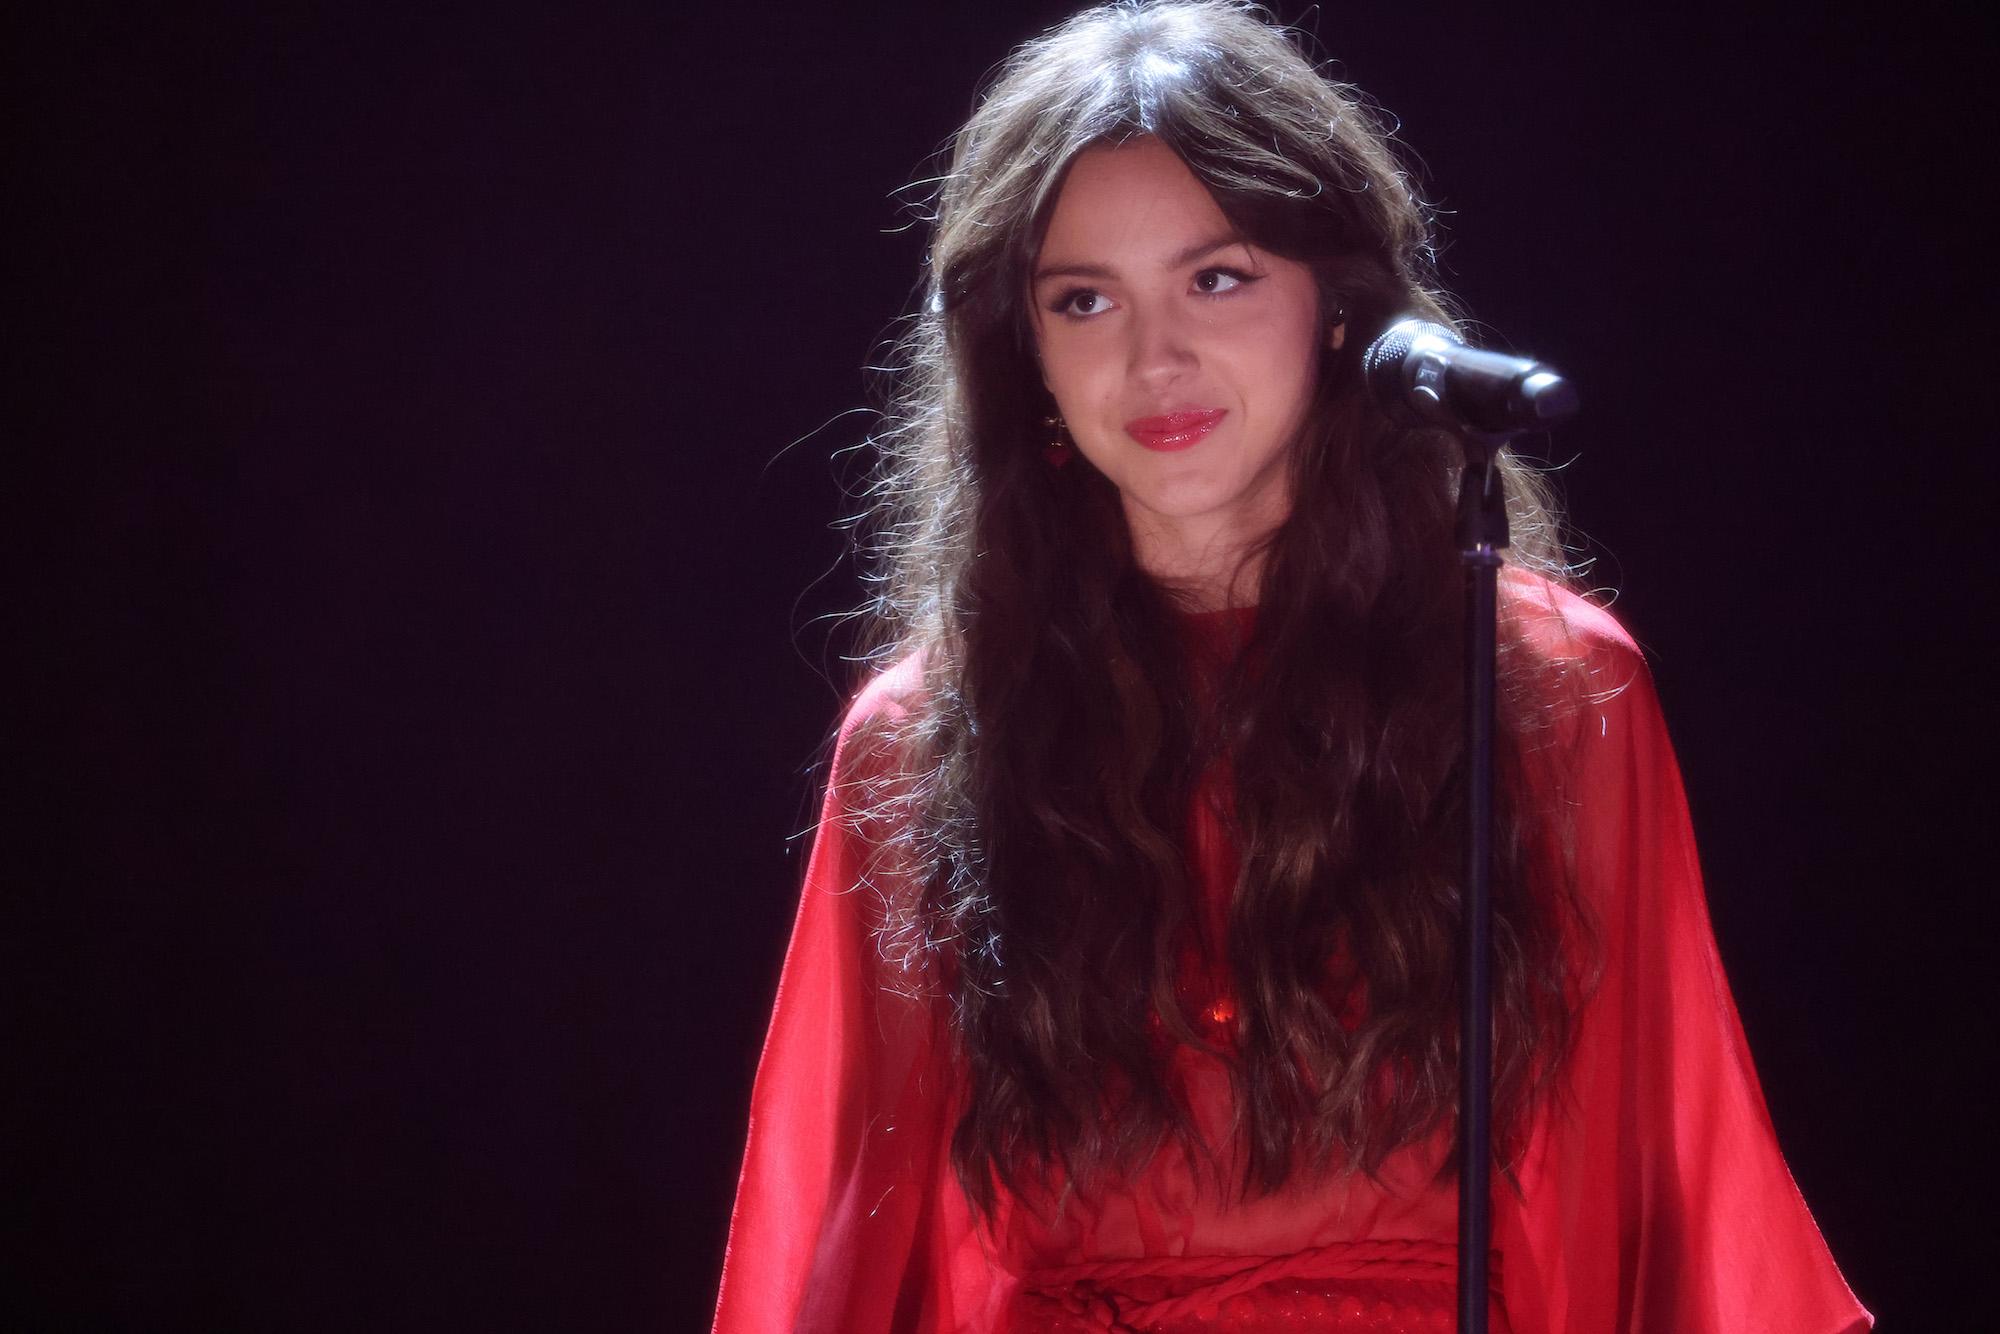 Olivia Rodrigo performs during The BRIT Awards 2021 at The O2 Arena on May 11, 2021